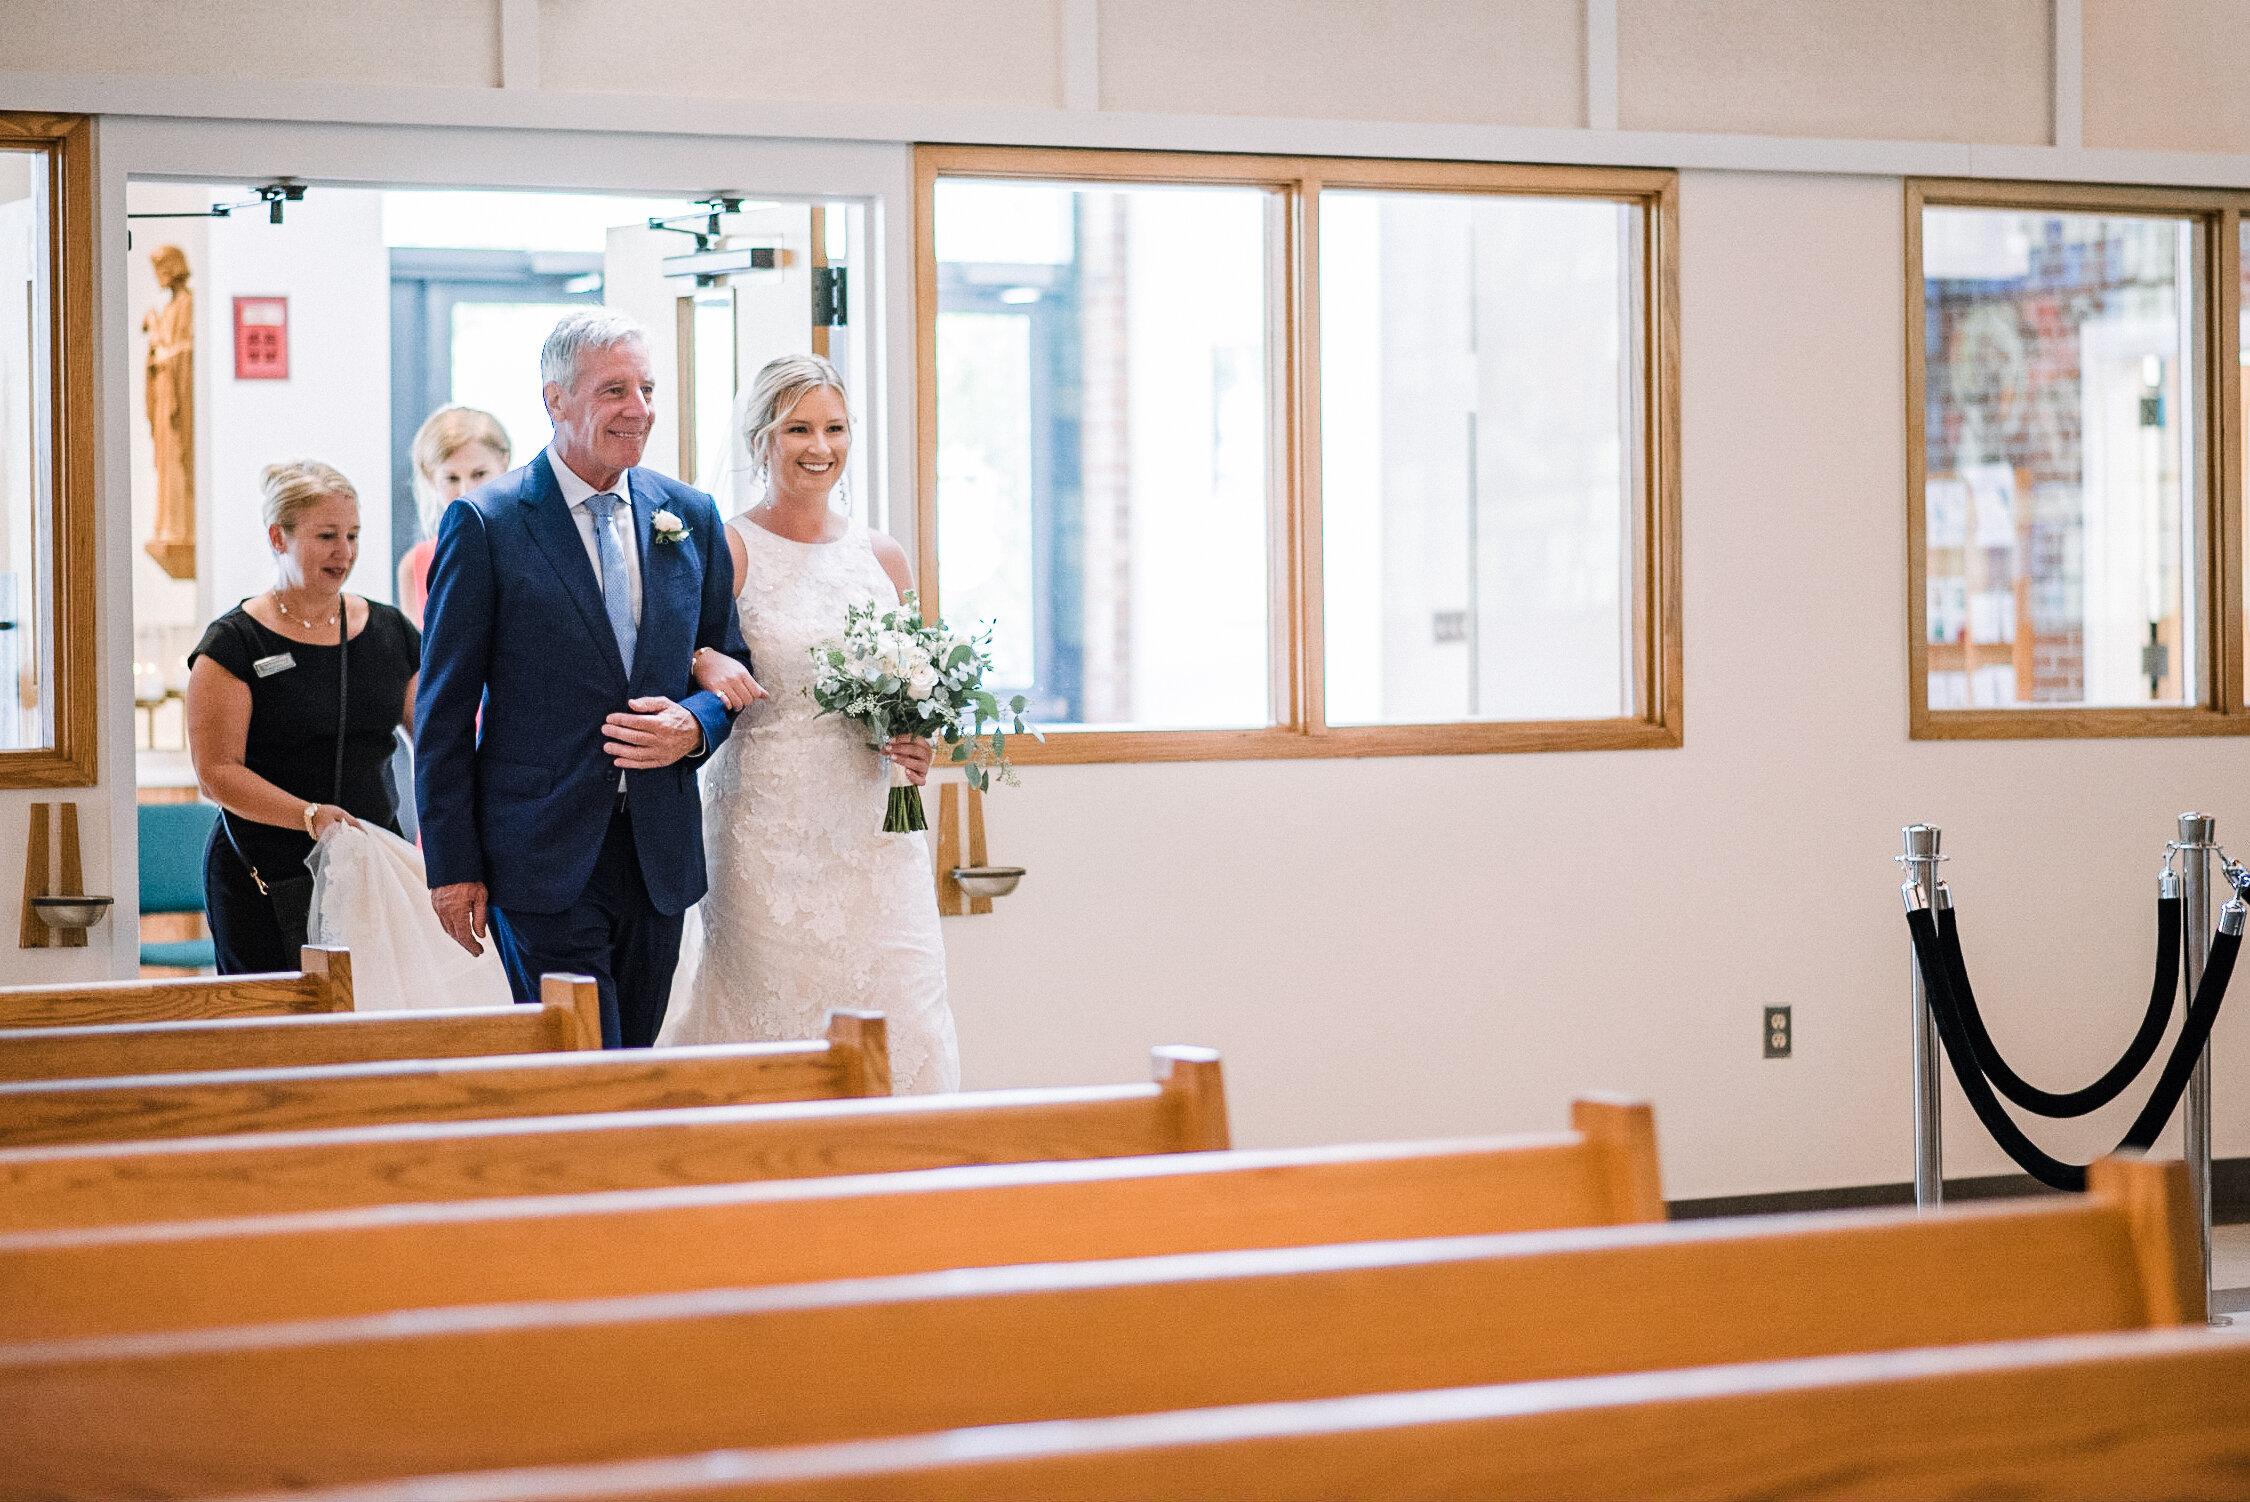 Bride walking down the aisle at St. Joseph Catholic Church